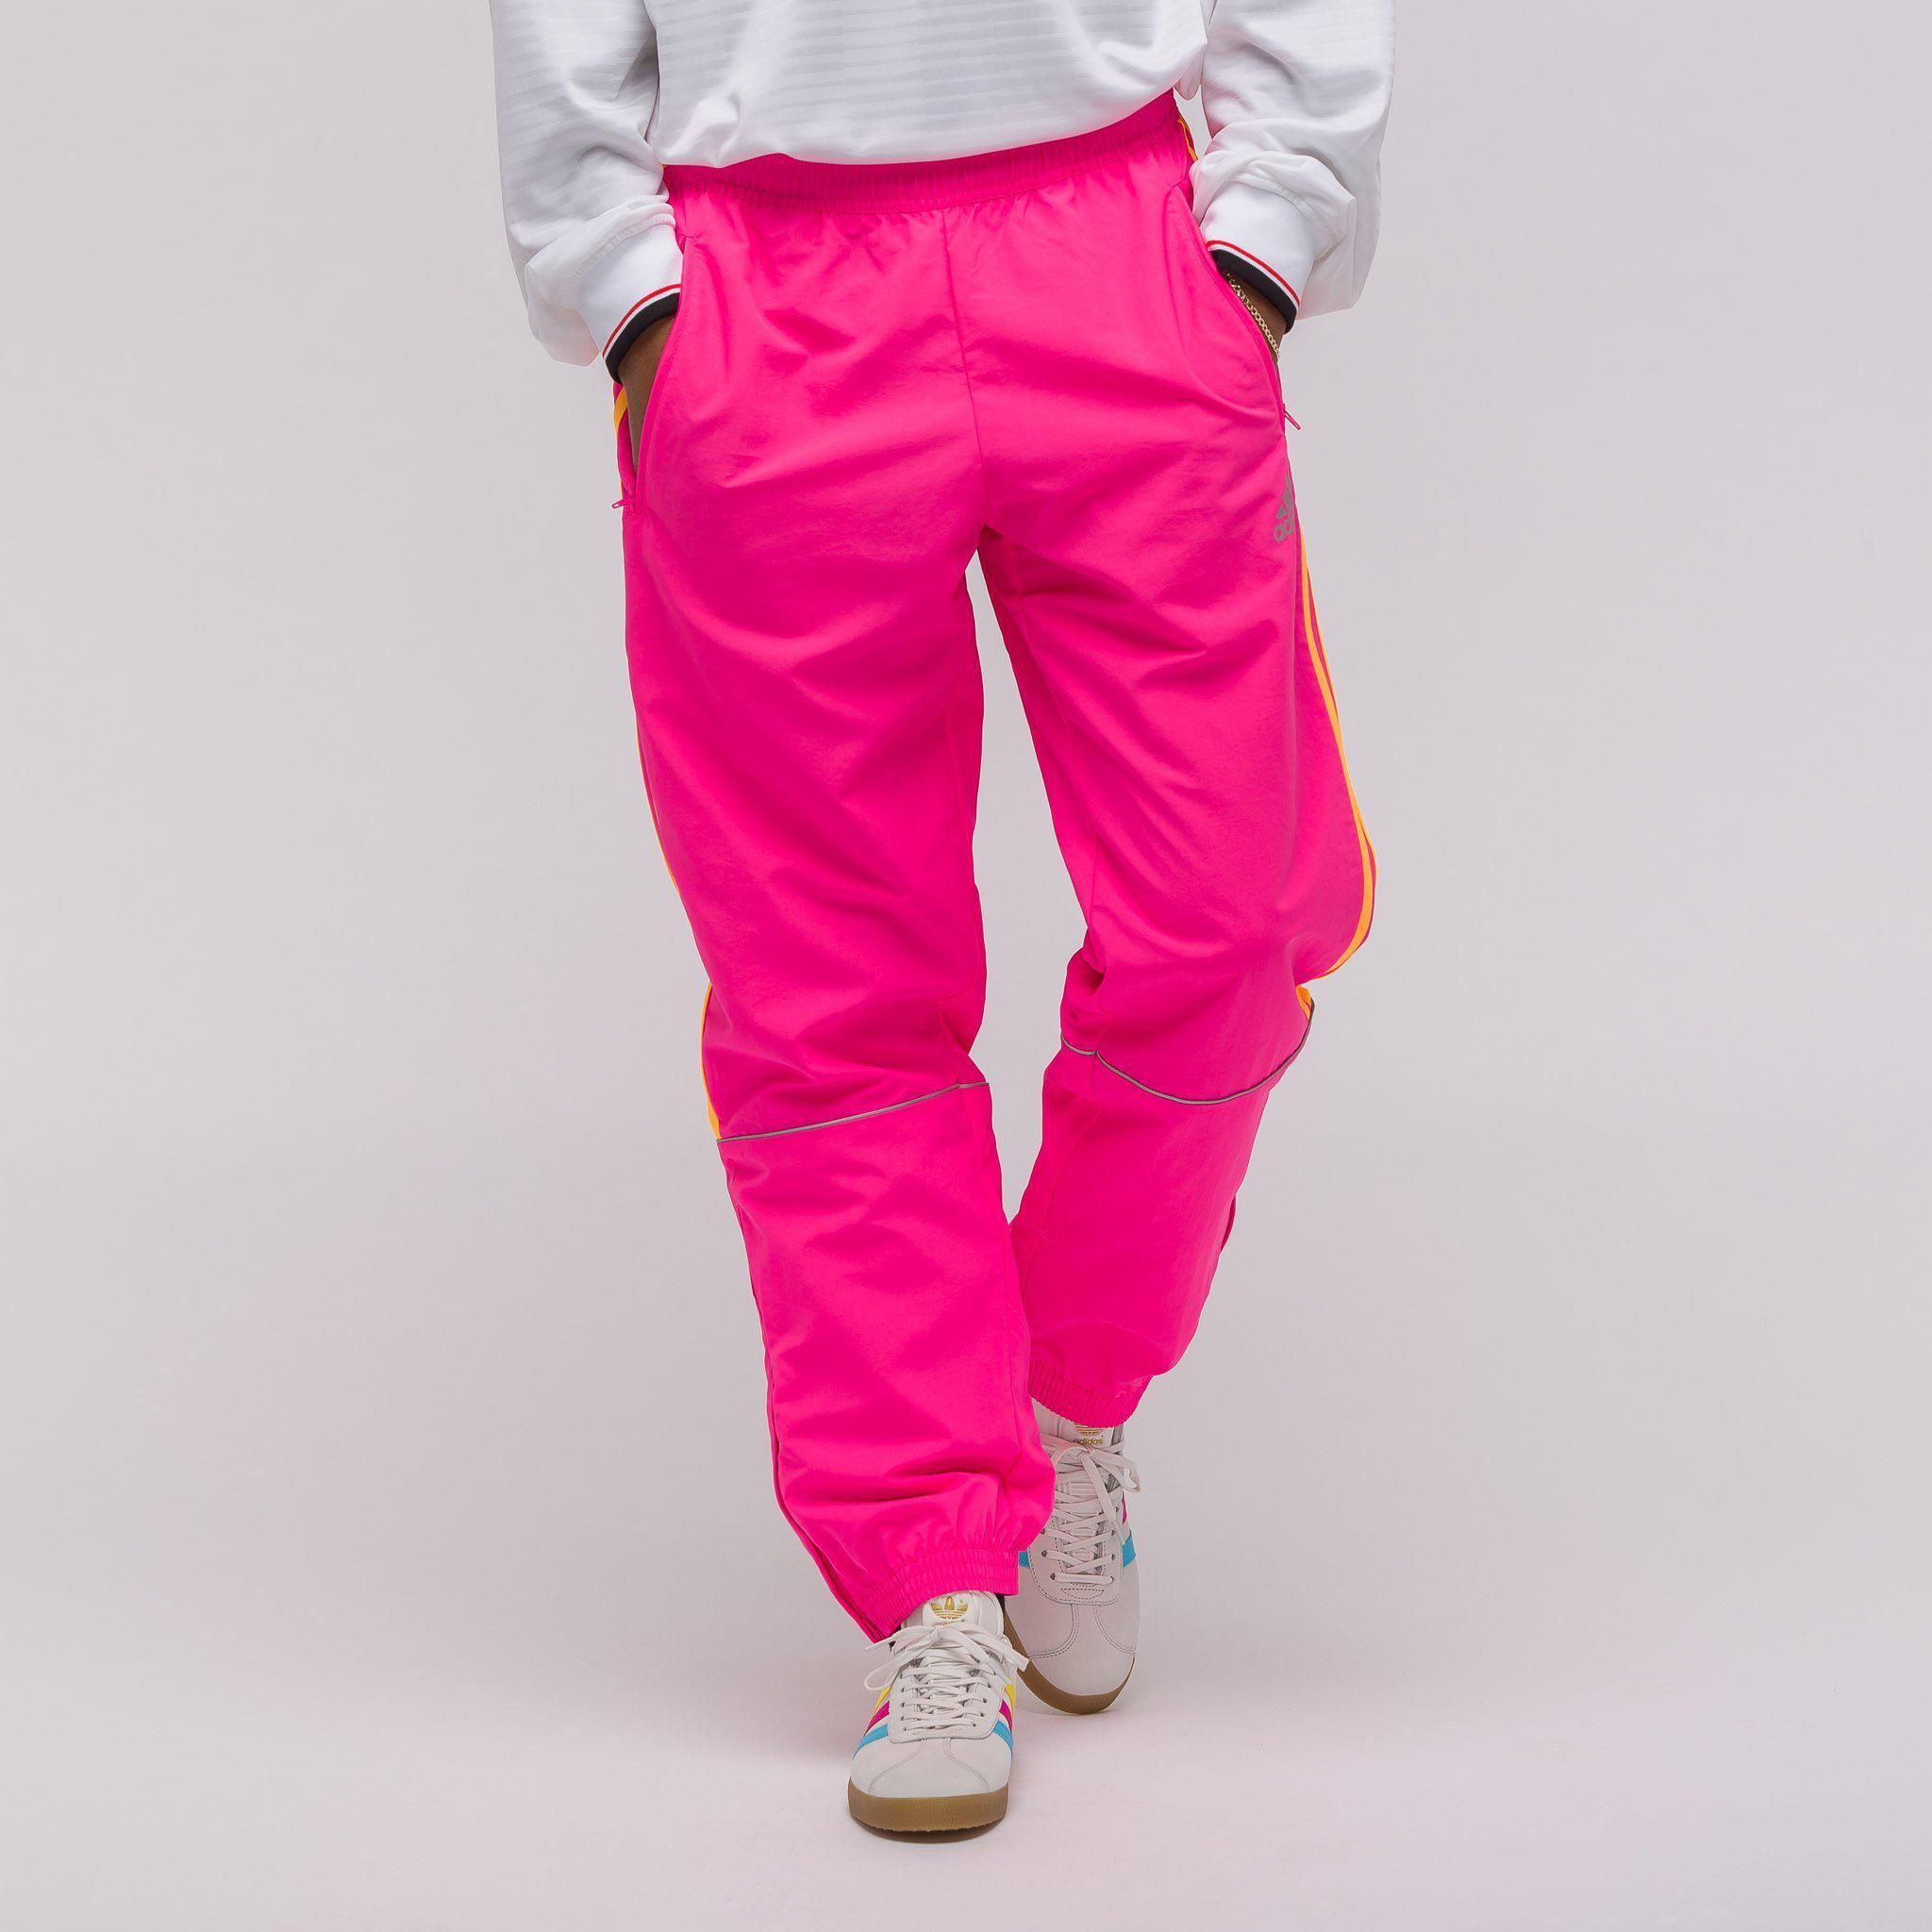 premium selection 81b01 8dd5d gosha rubchinskiy adidas pants lyst gosha rubchinskiy x adidas track in  pink in